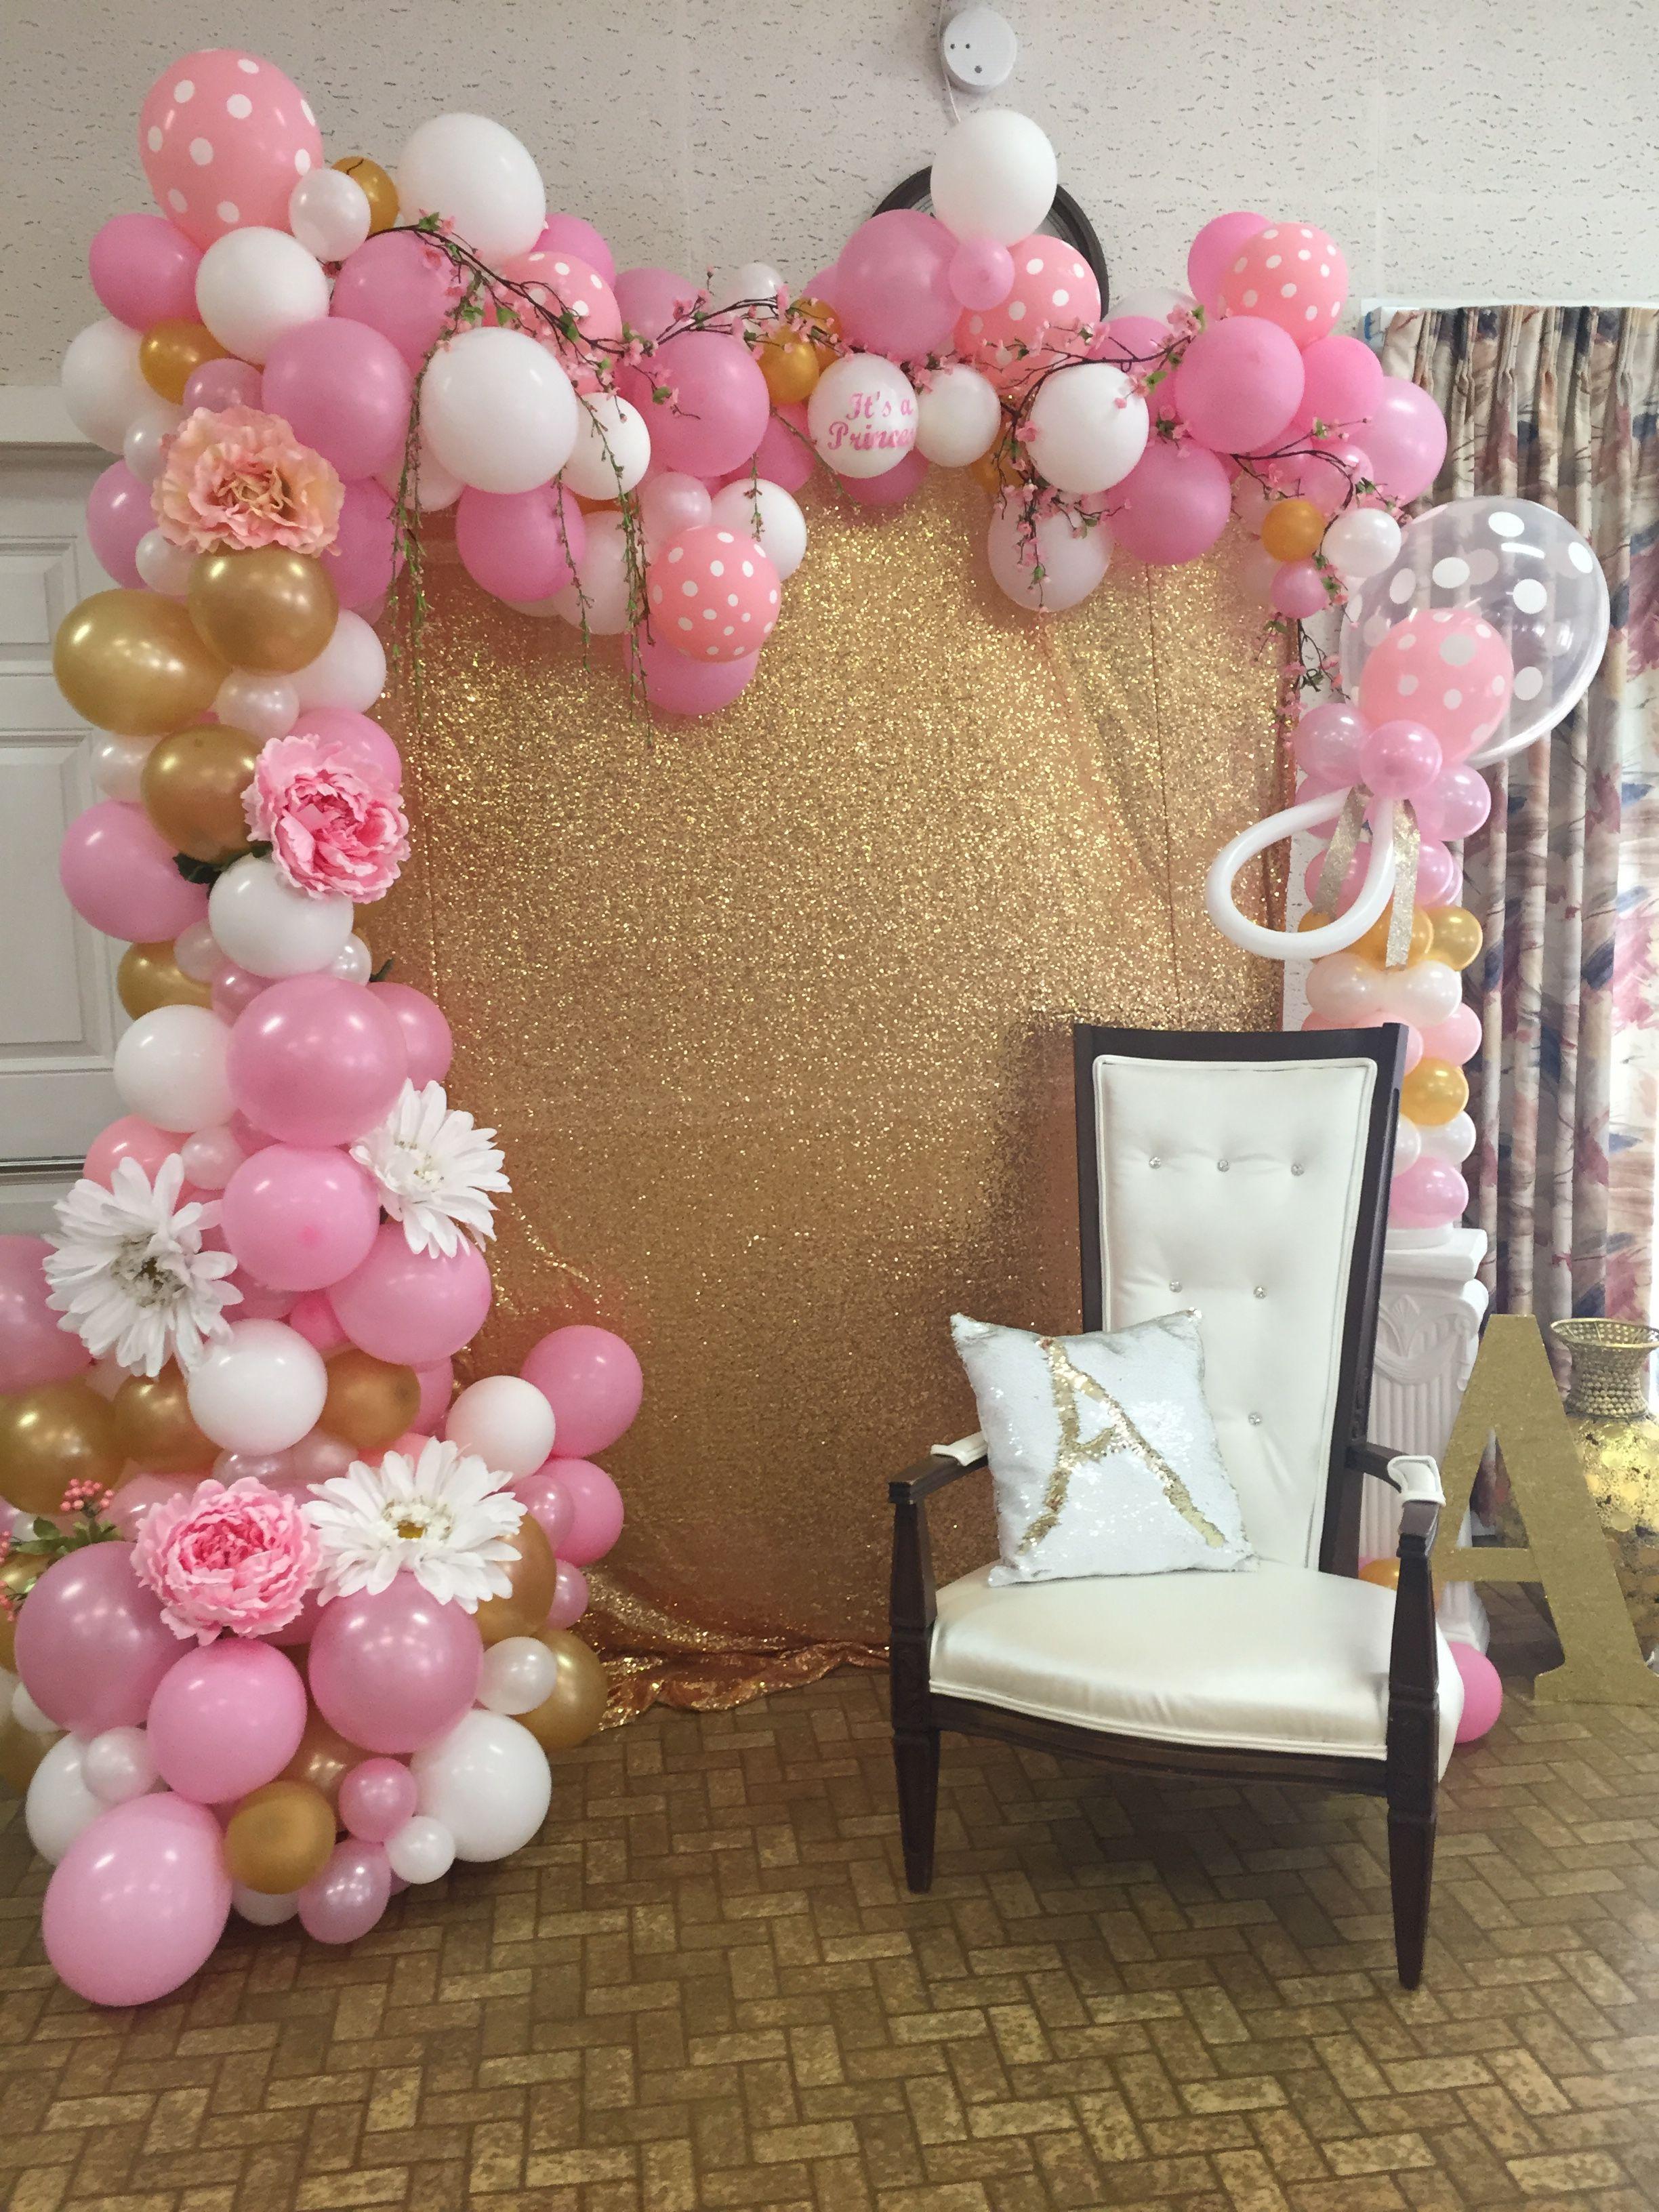 Rose Pink Bathroom